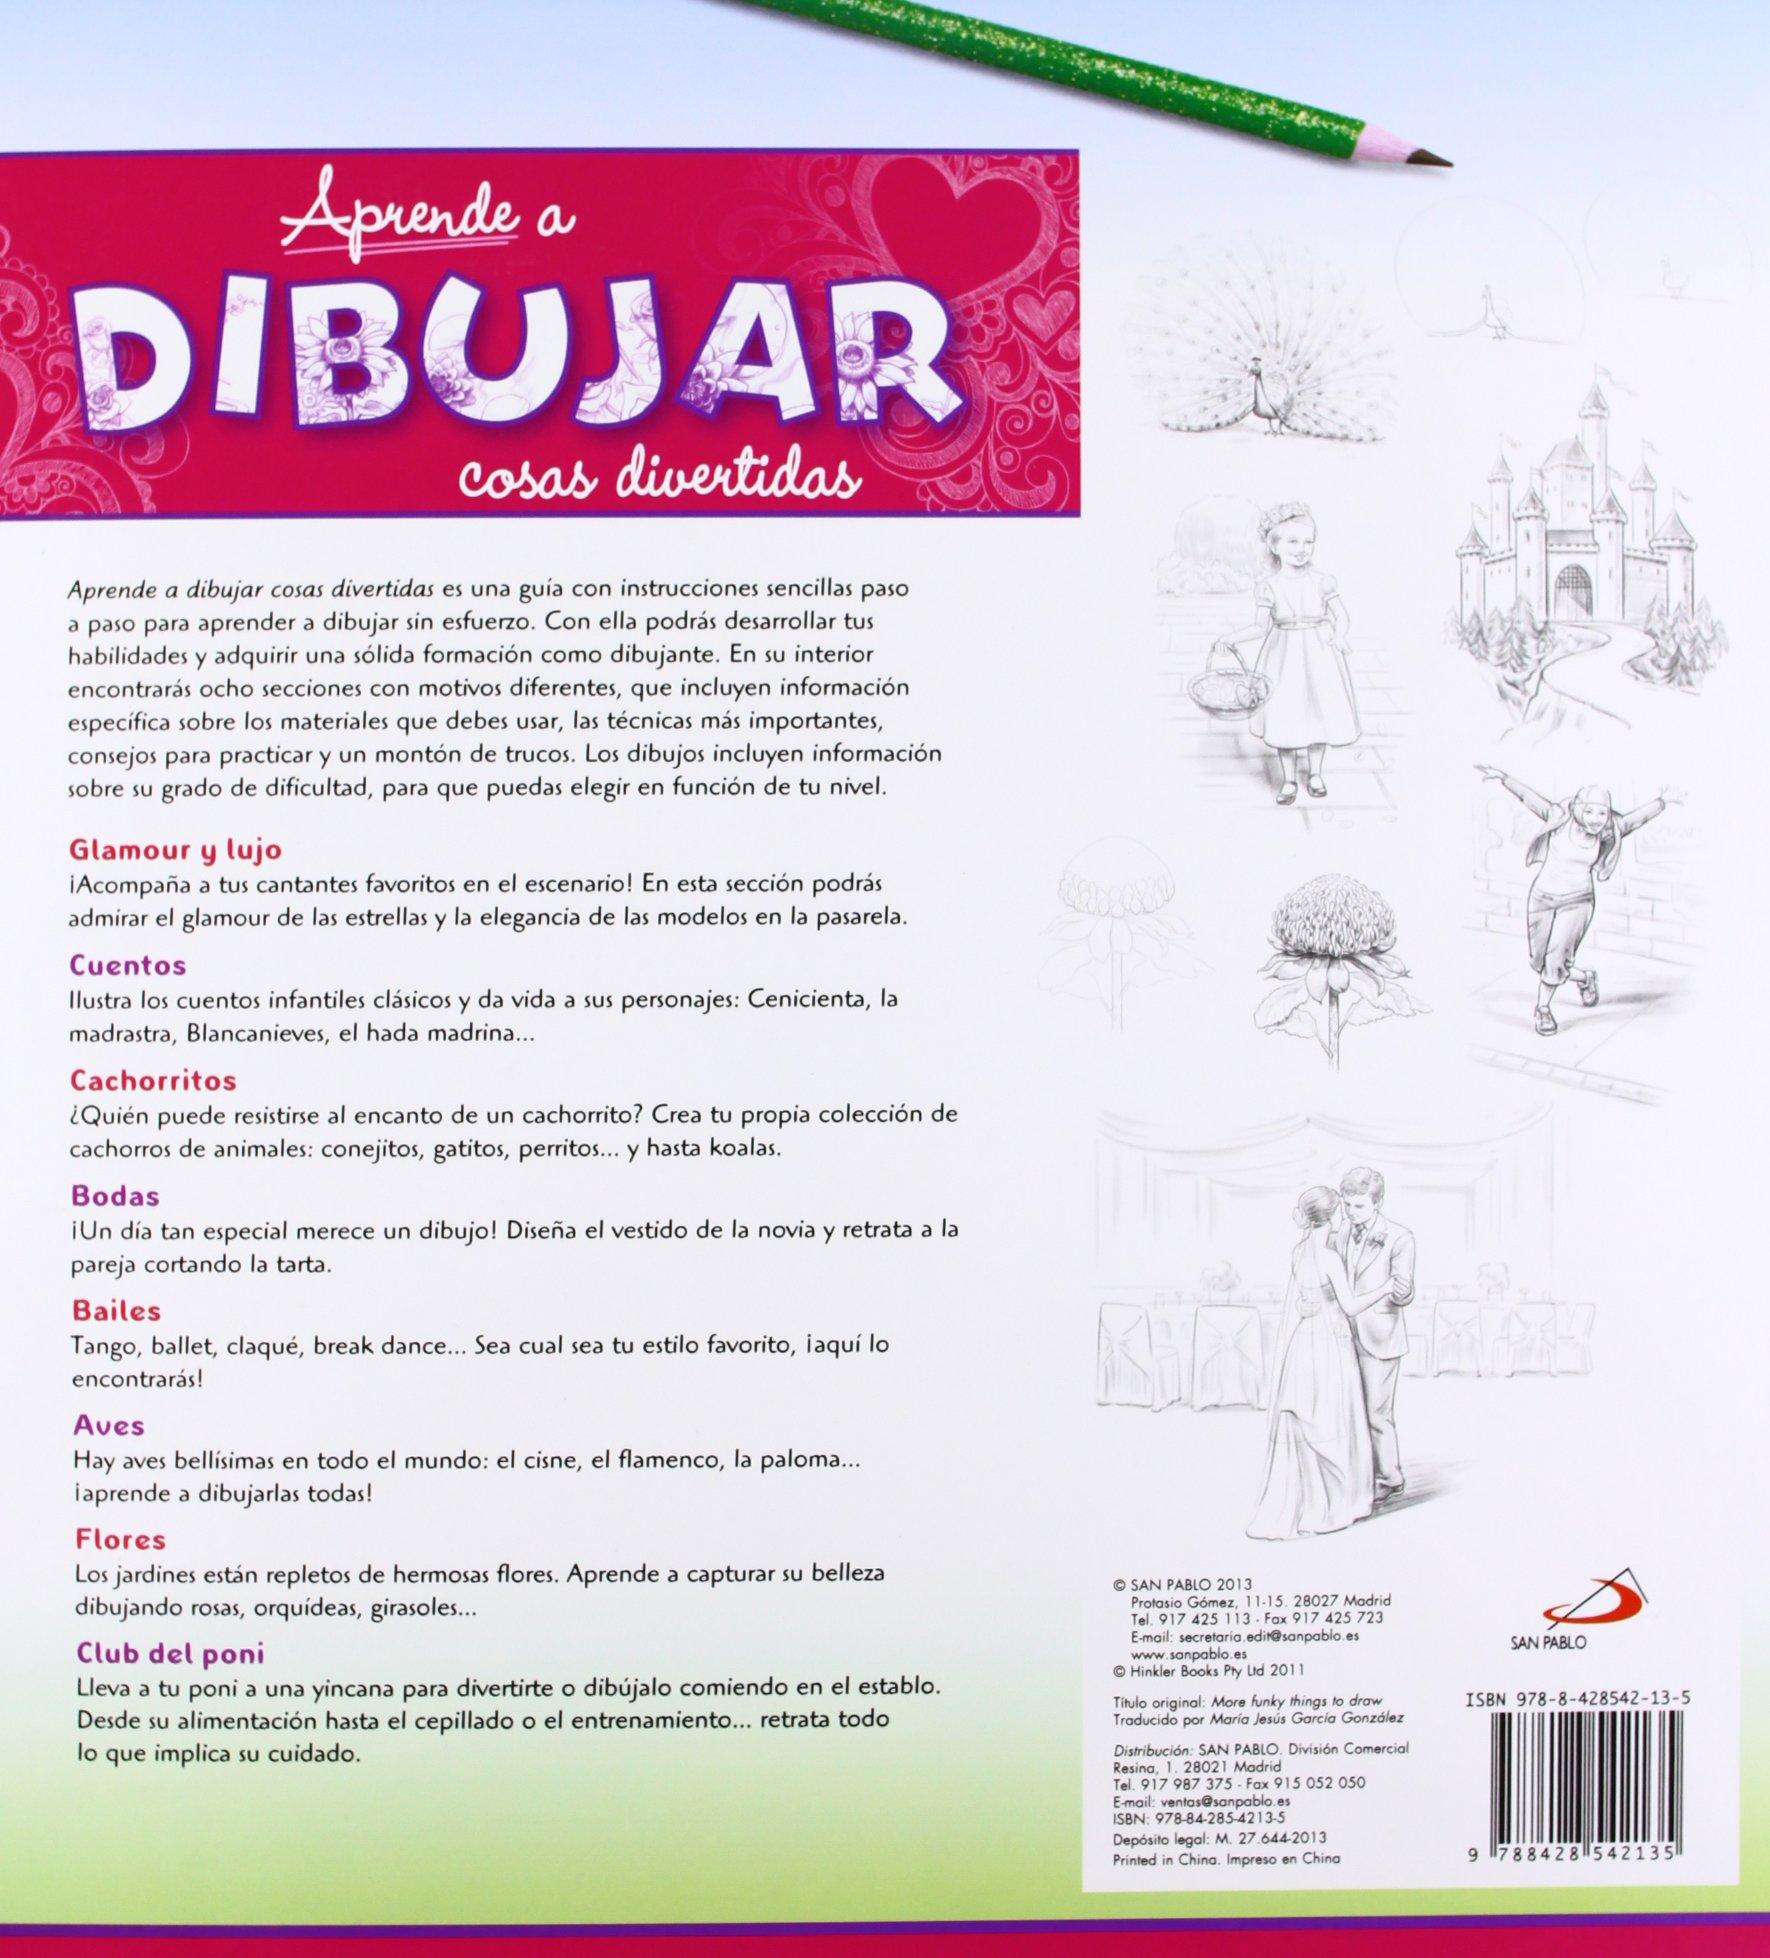 Aprende a dibujar cosas divertidas: Kate Ashforth: 9788428542135: Amazon.com: Books